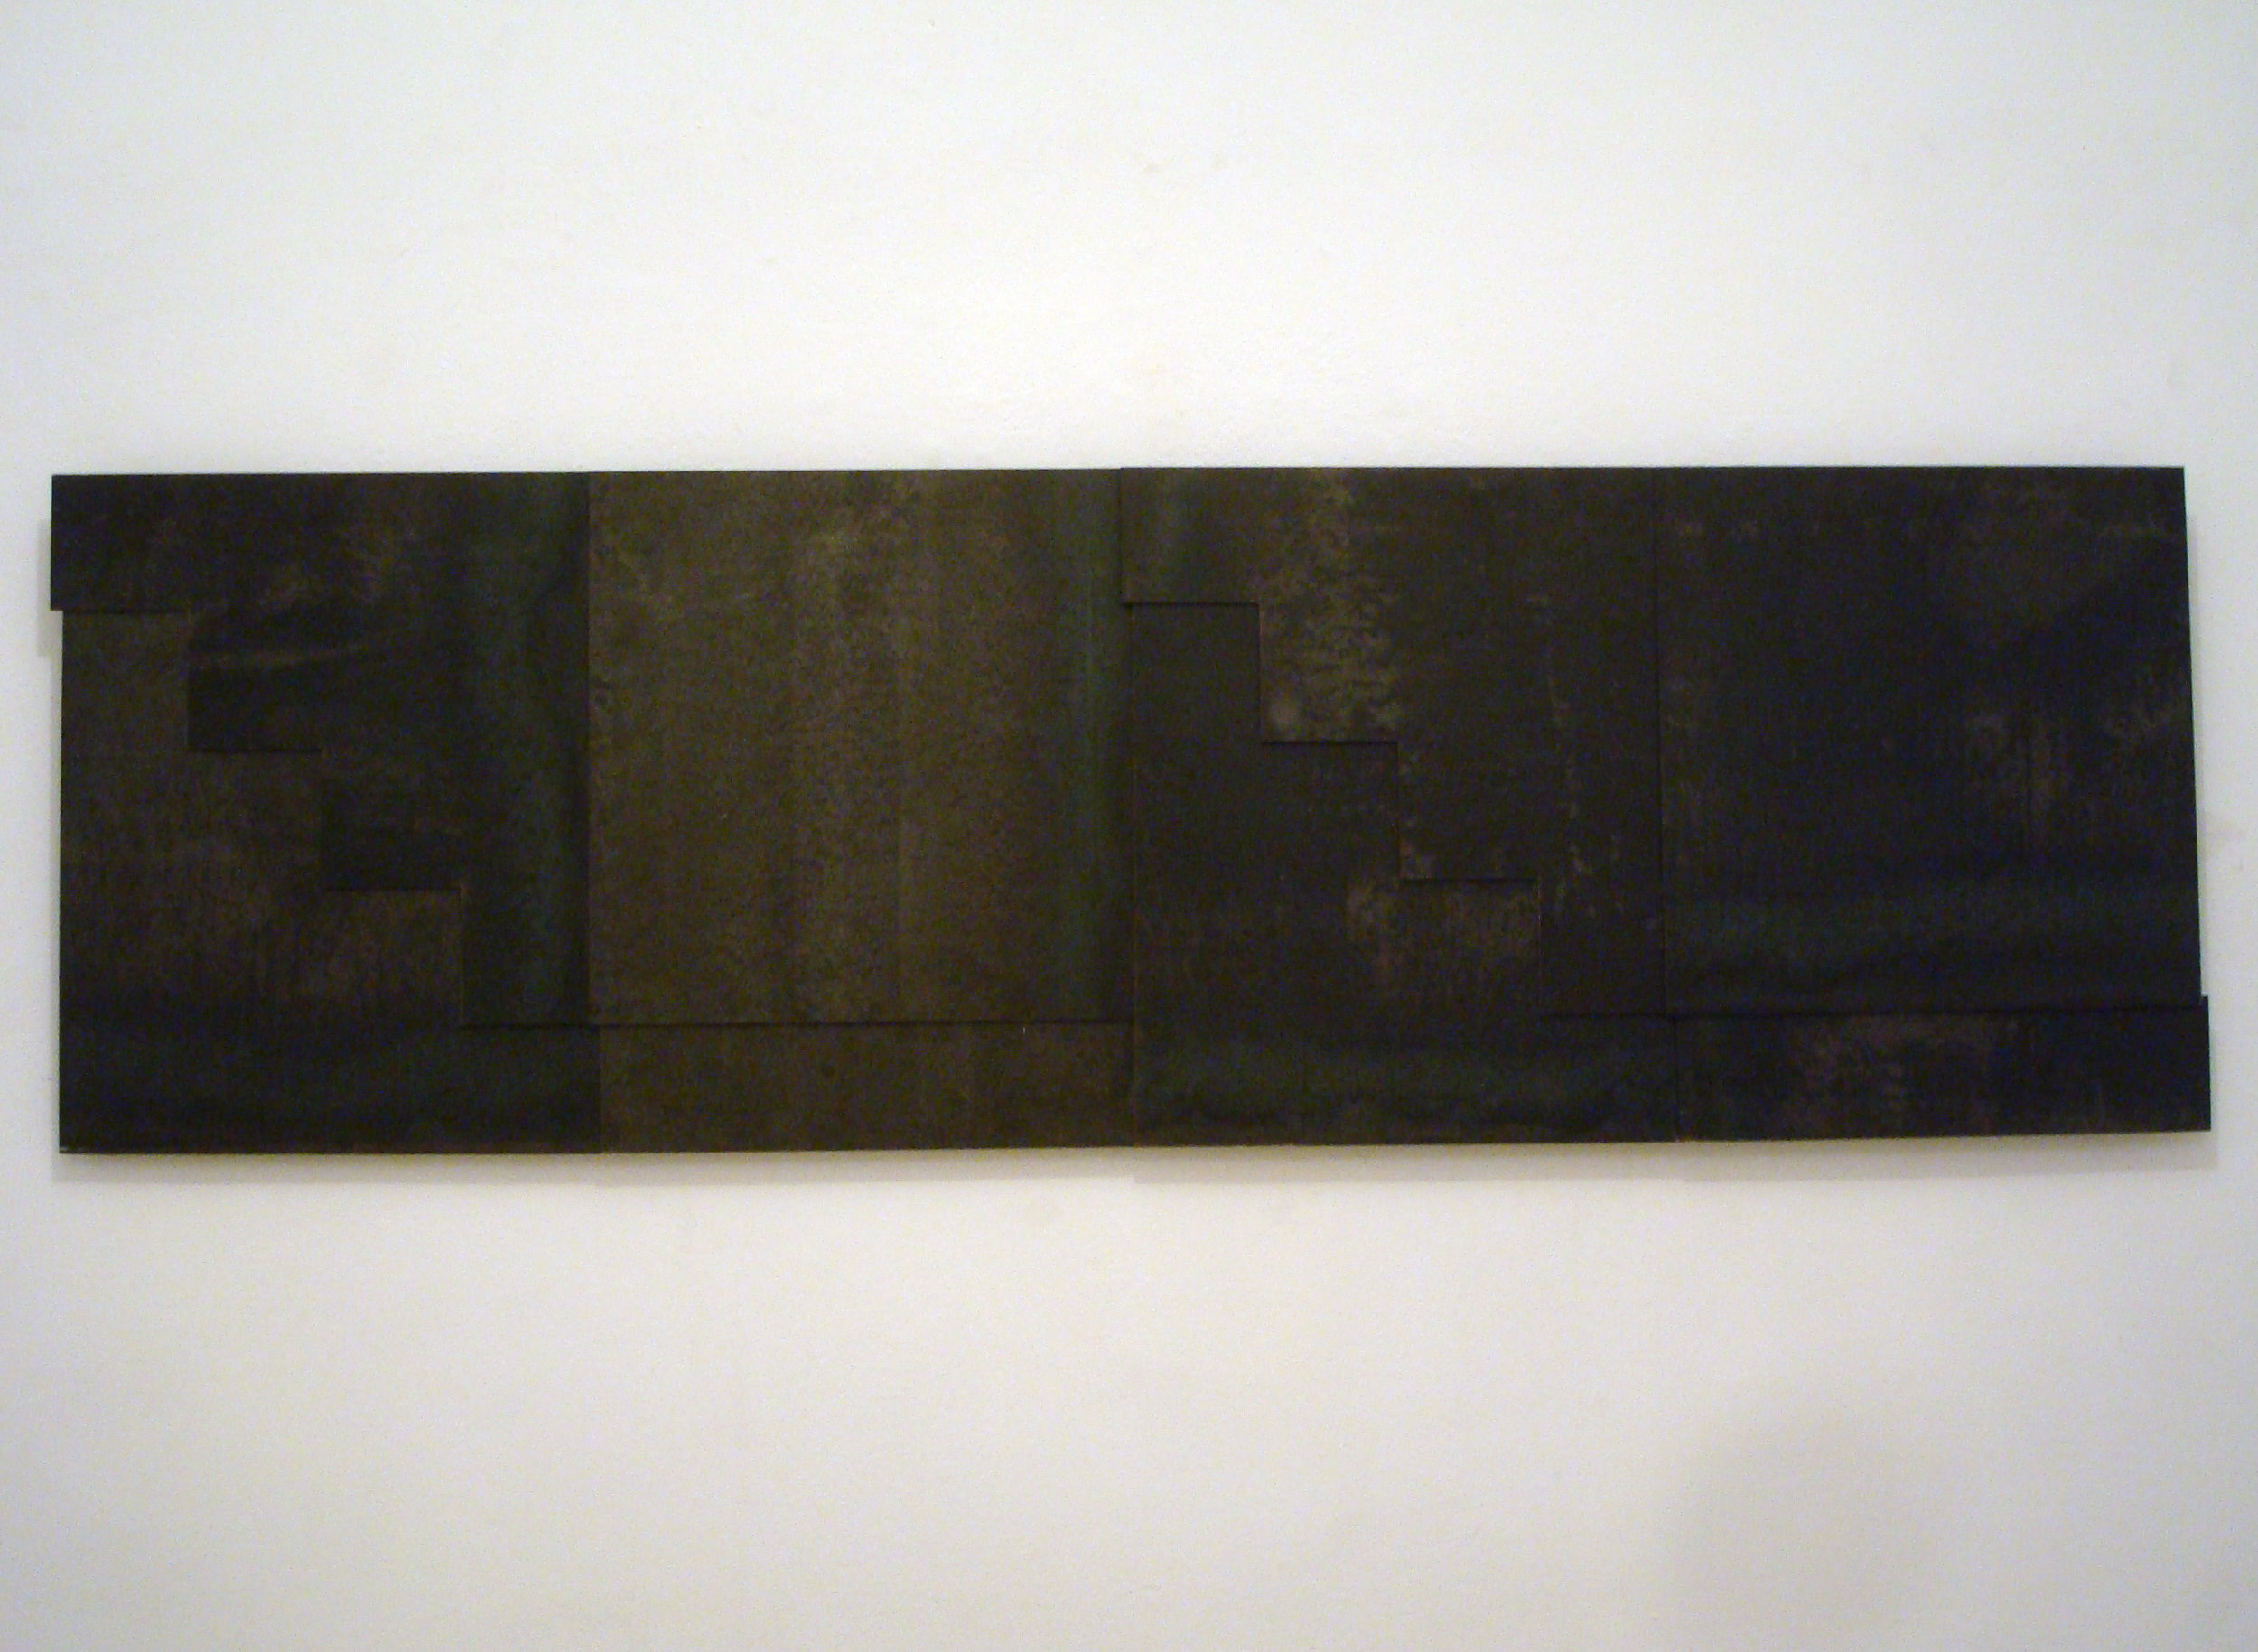 Nicola Carrino, Rilievo 18-8, 1973, Ferro, 200 x 62, 5 cm.jpg